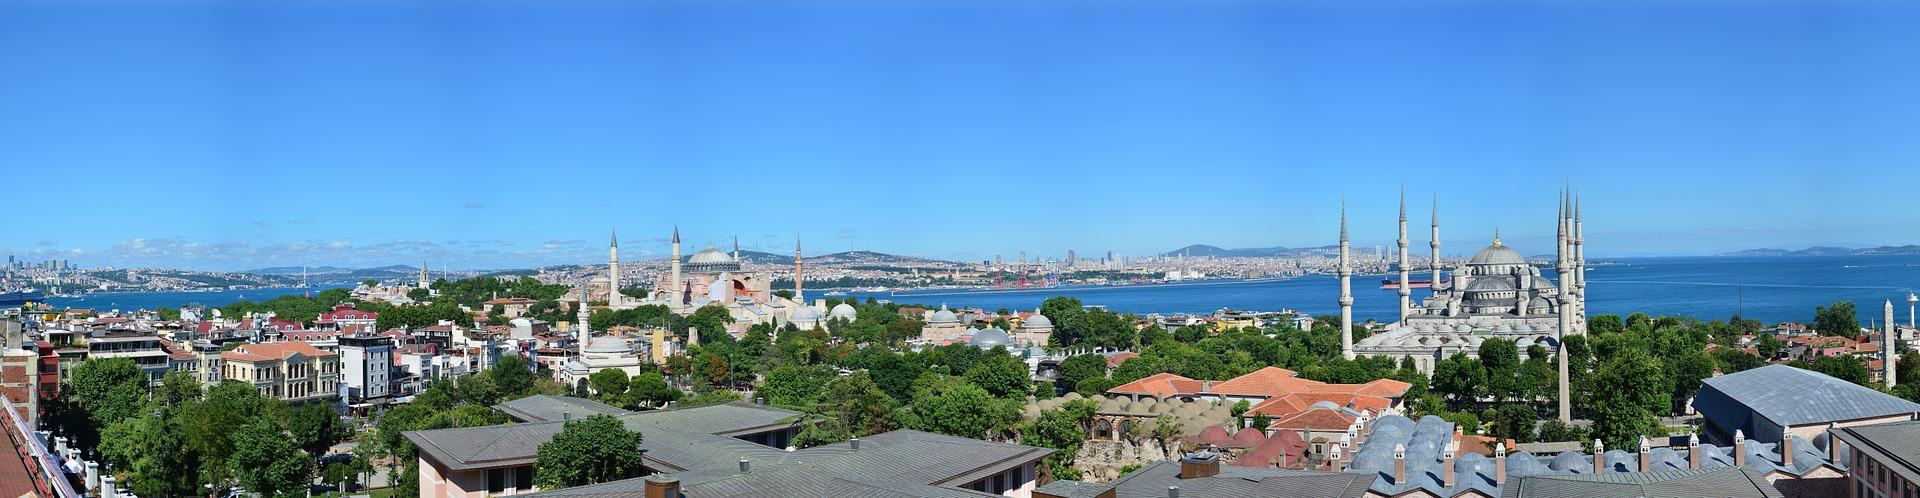 istanbul-1261194_1920